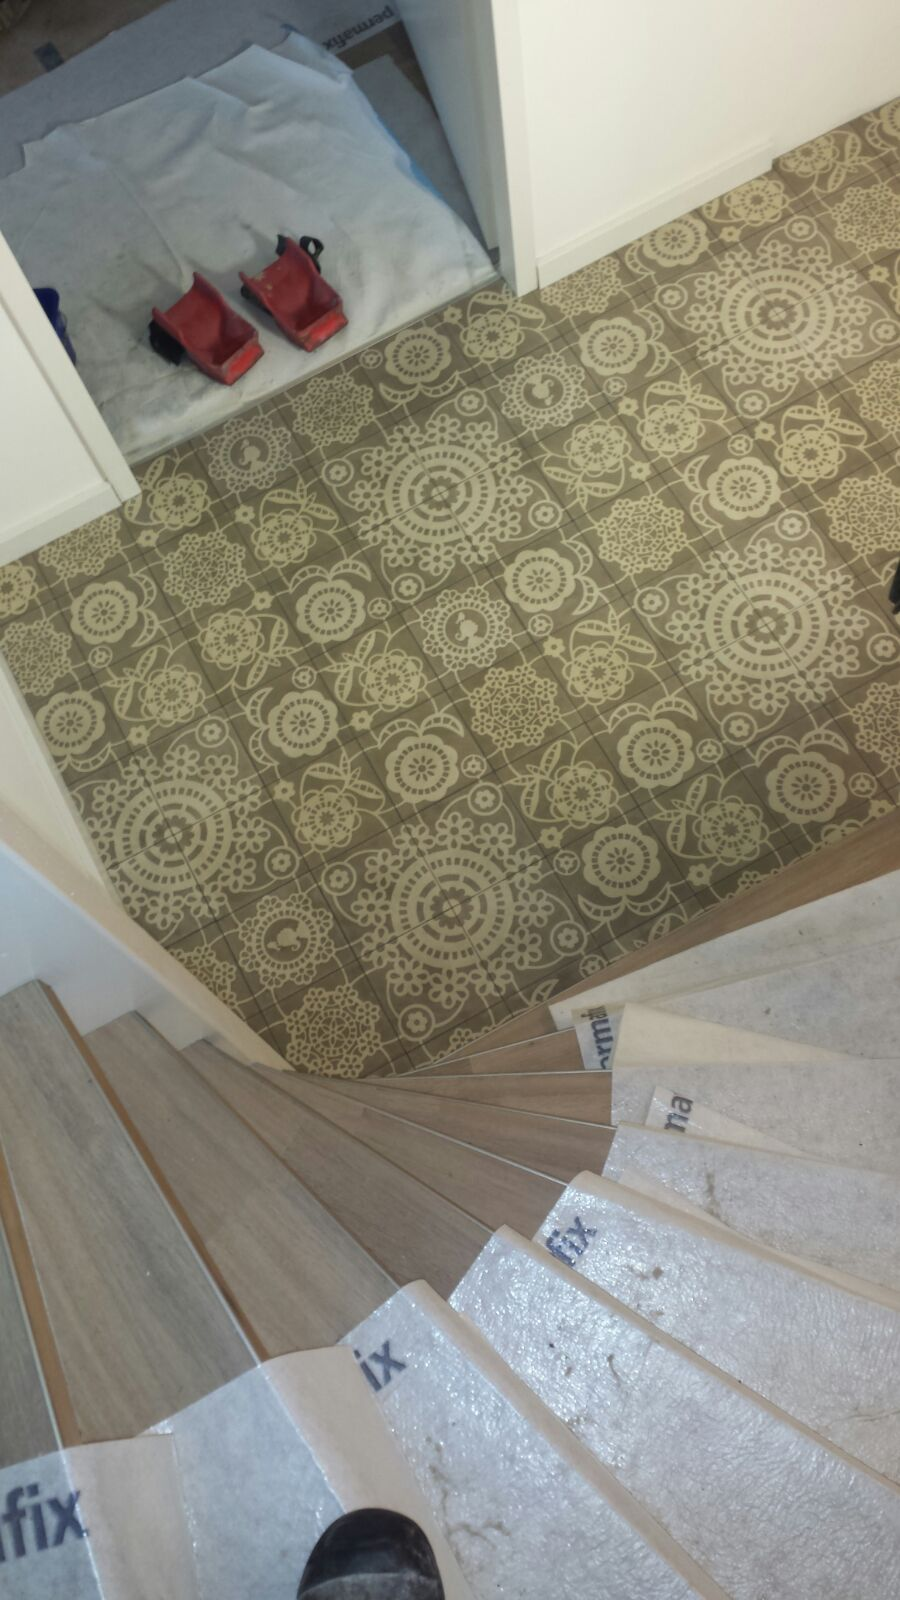 Pip patroon vloer in Hoogezand